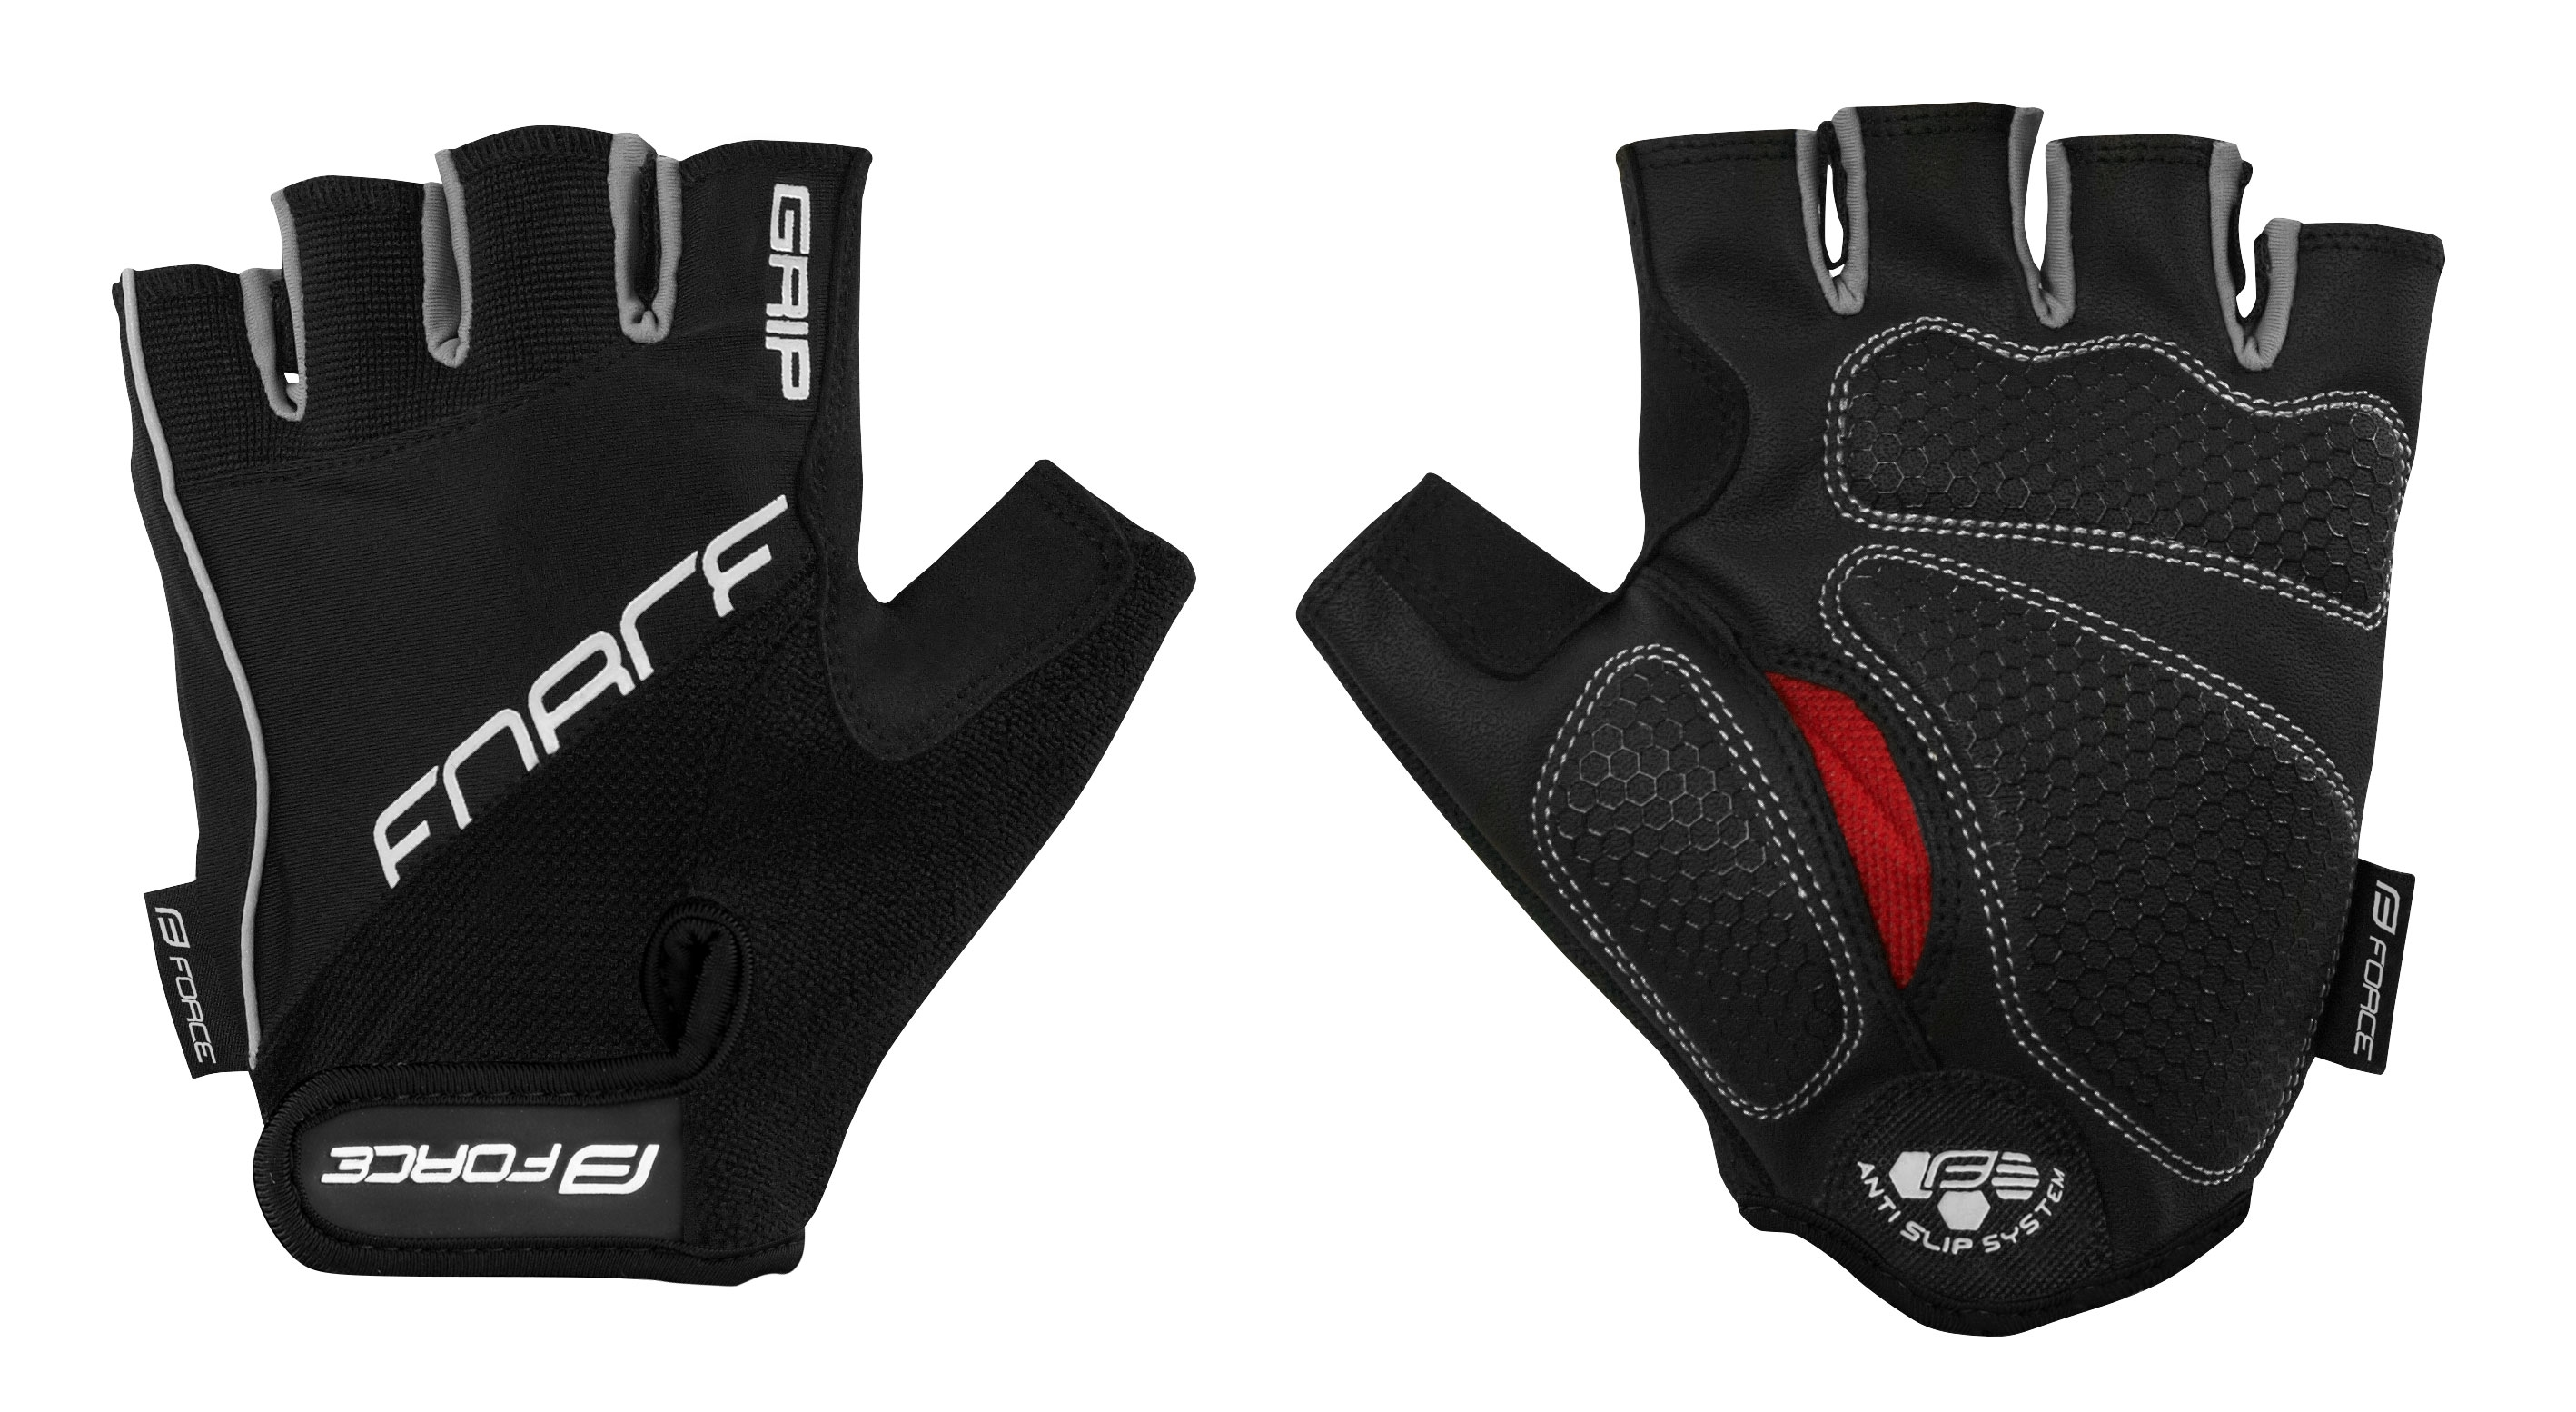 rukavice FORCE GRIP gel, černé XL